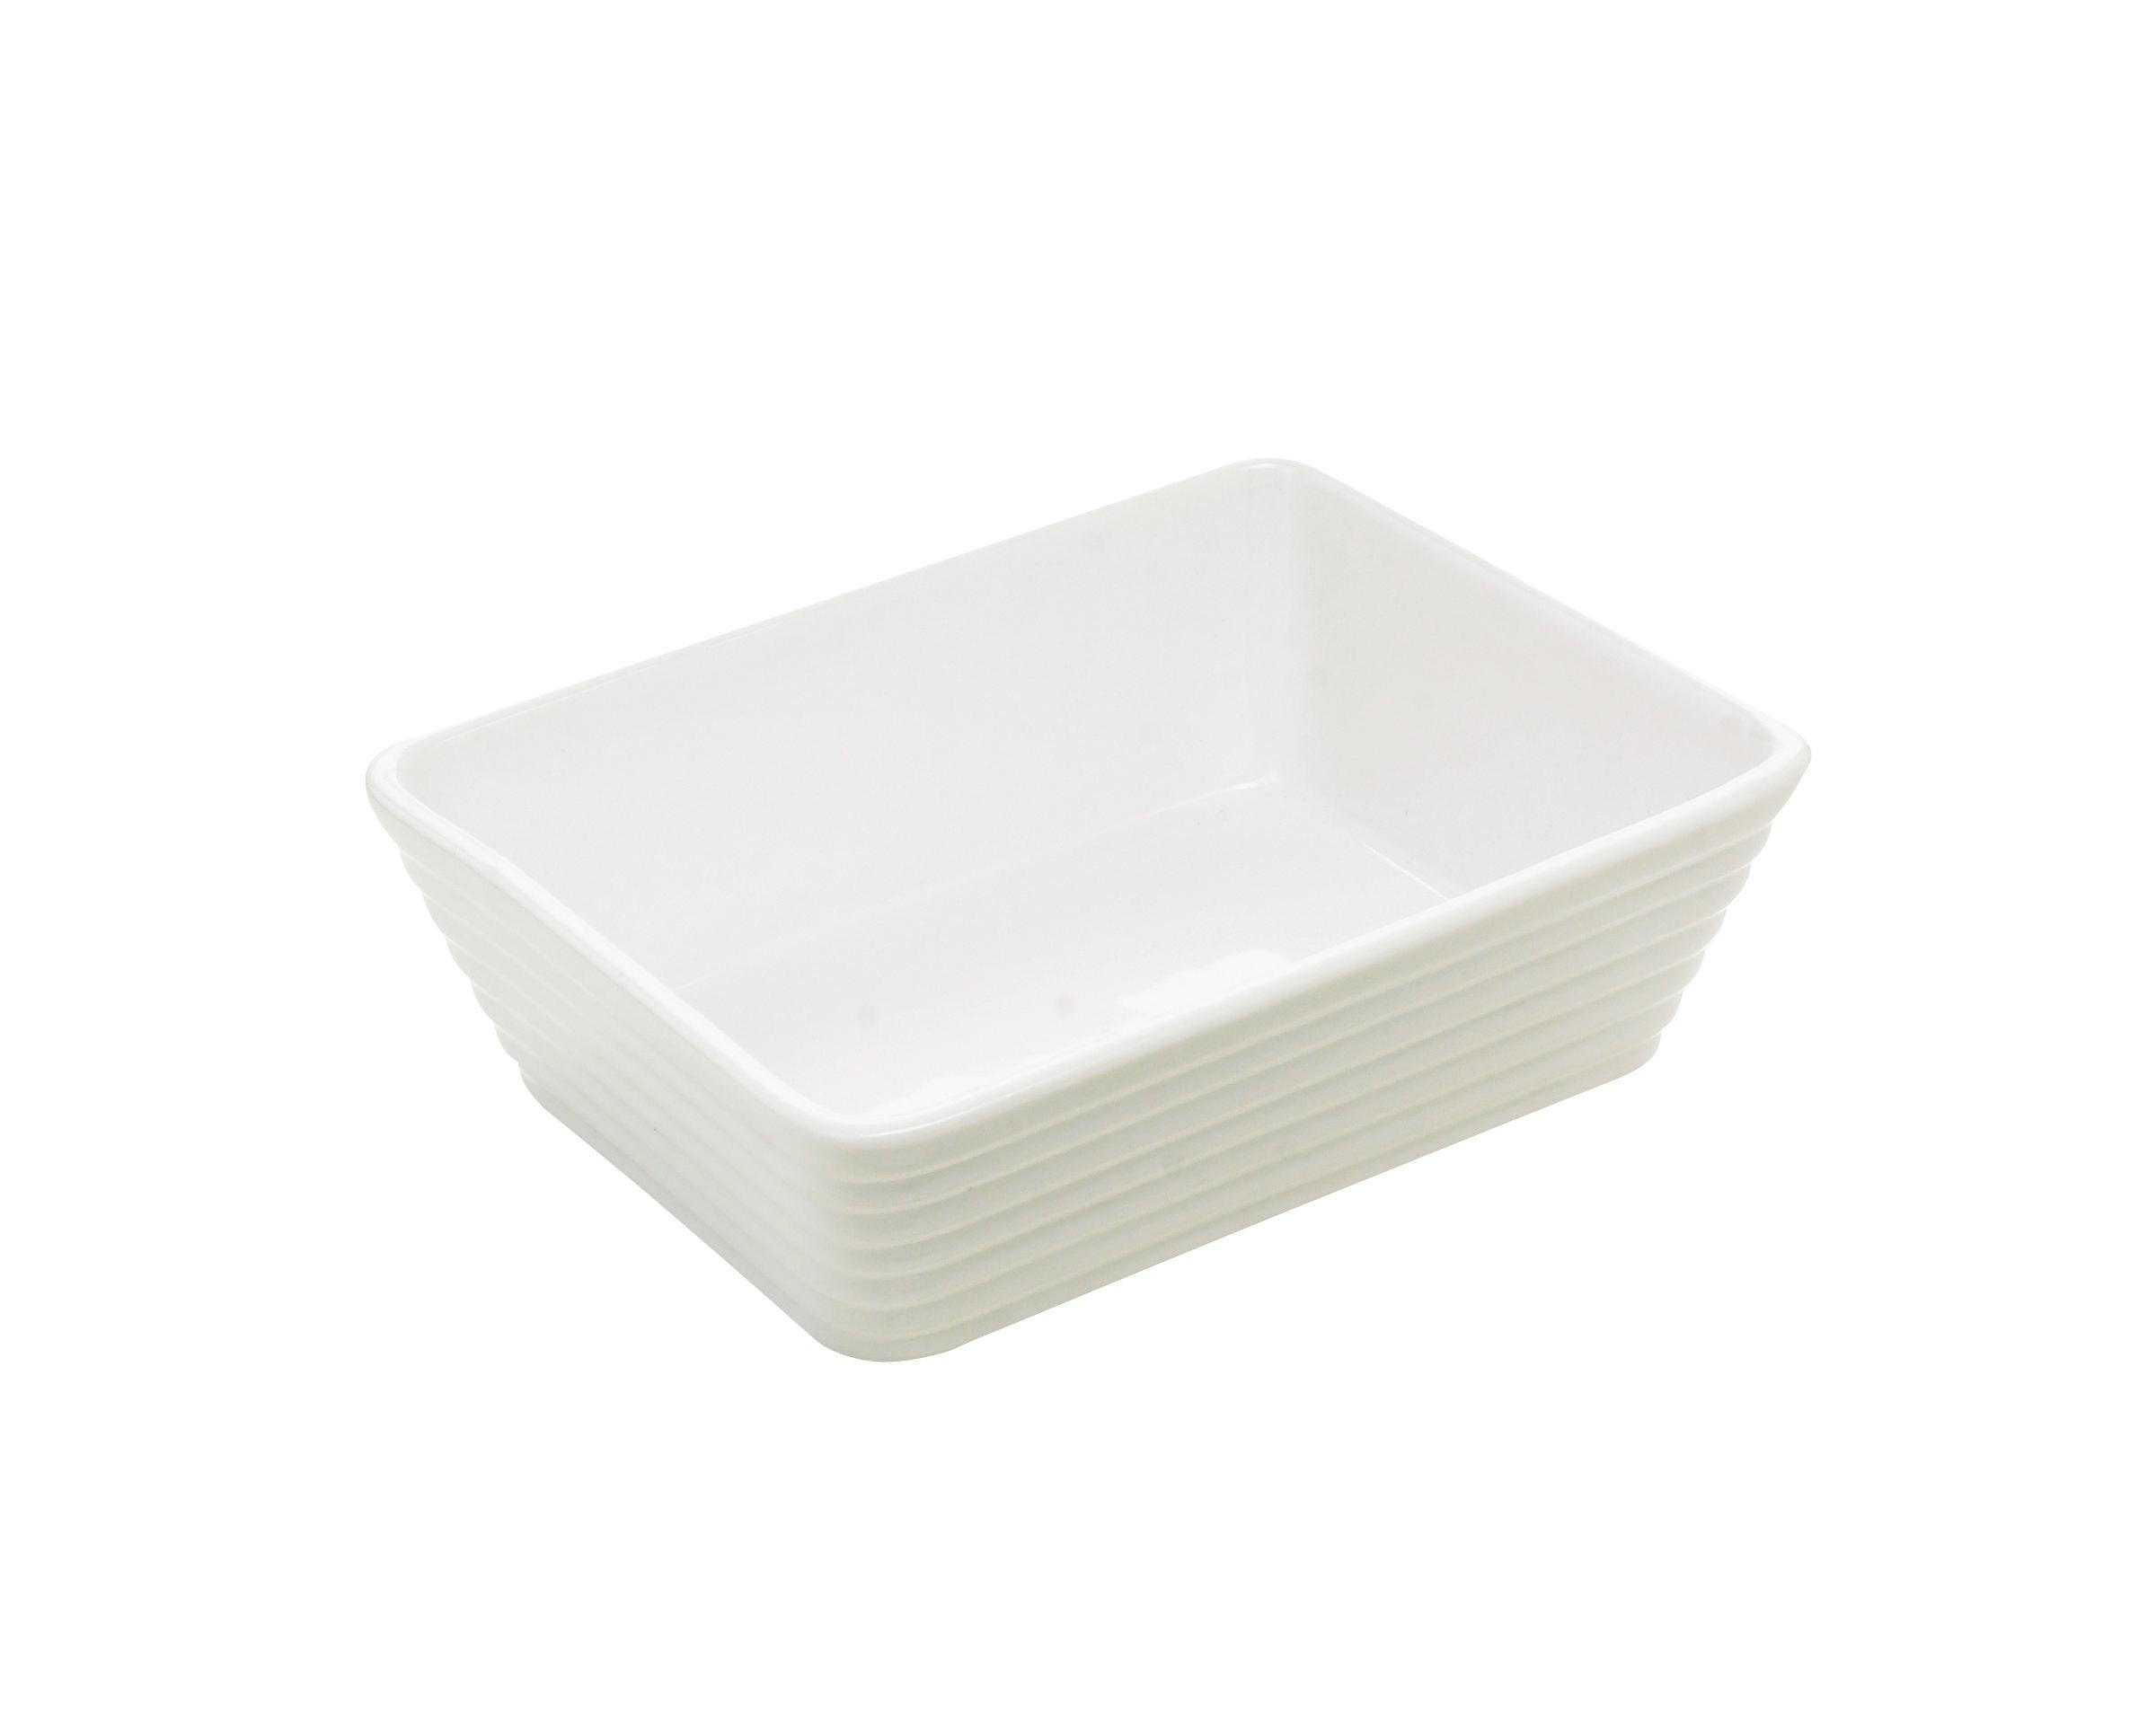 PEKAČ - bela, Konvencionalno, keramika (18/13,5/5cm) - HOMEWARE